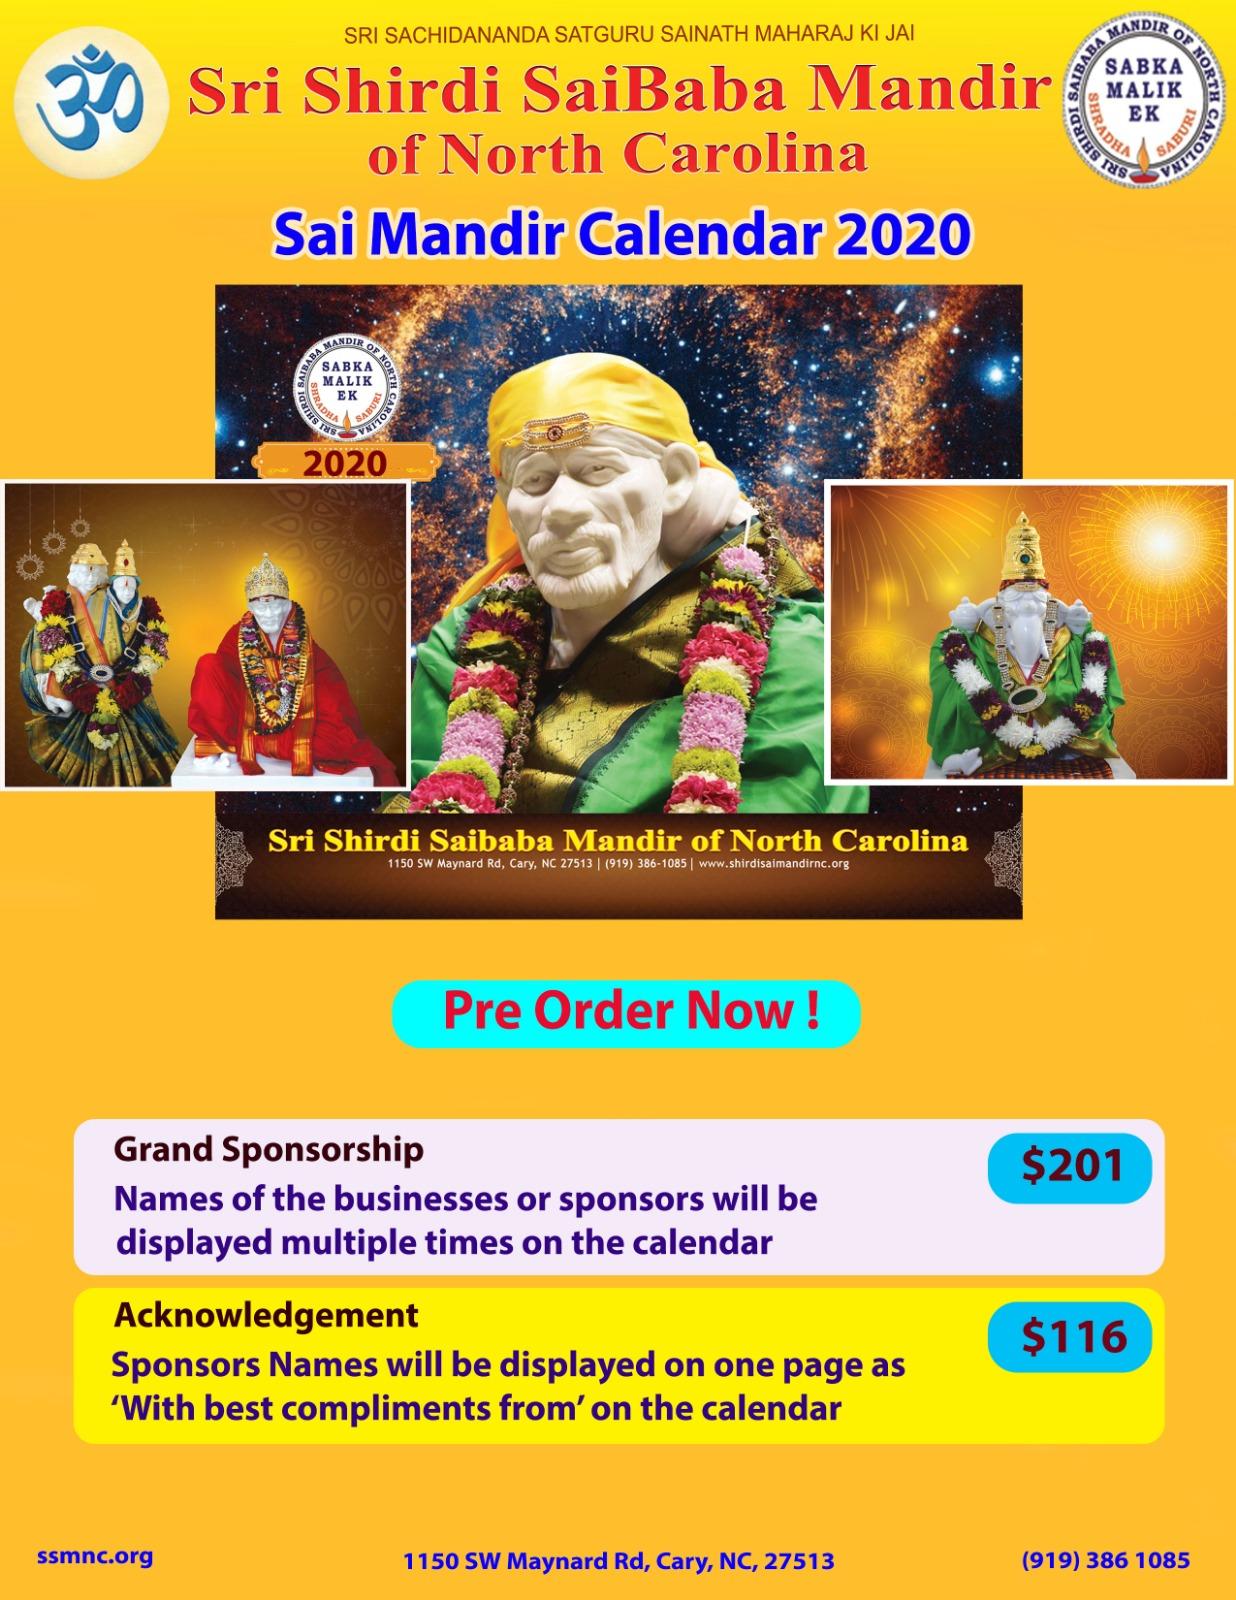 SSMNC_Calendar_2020.jpeg